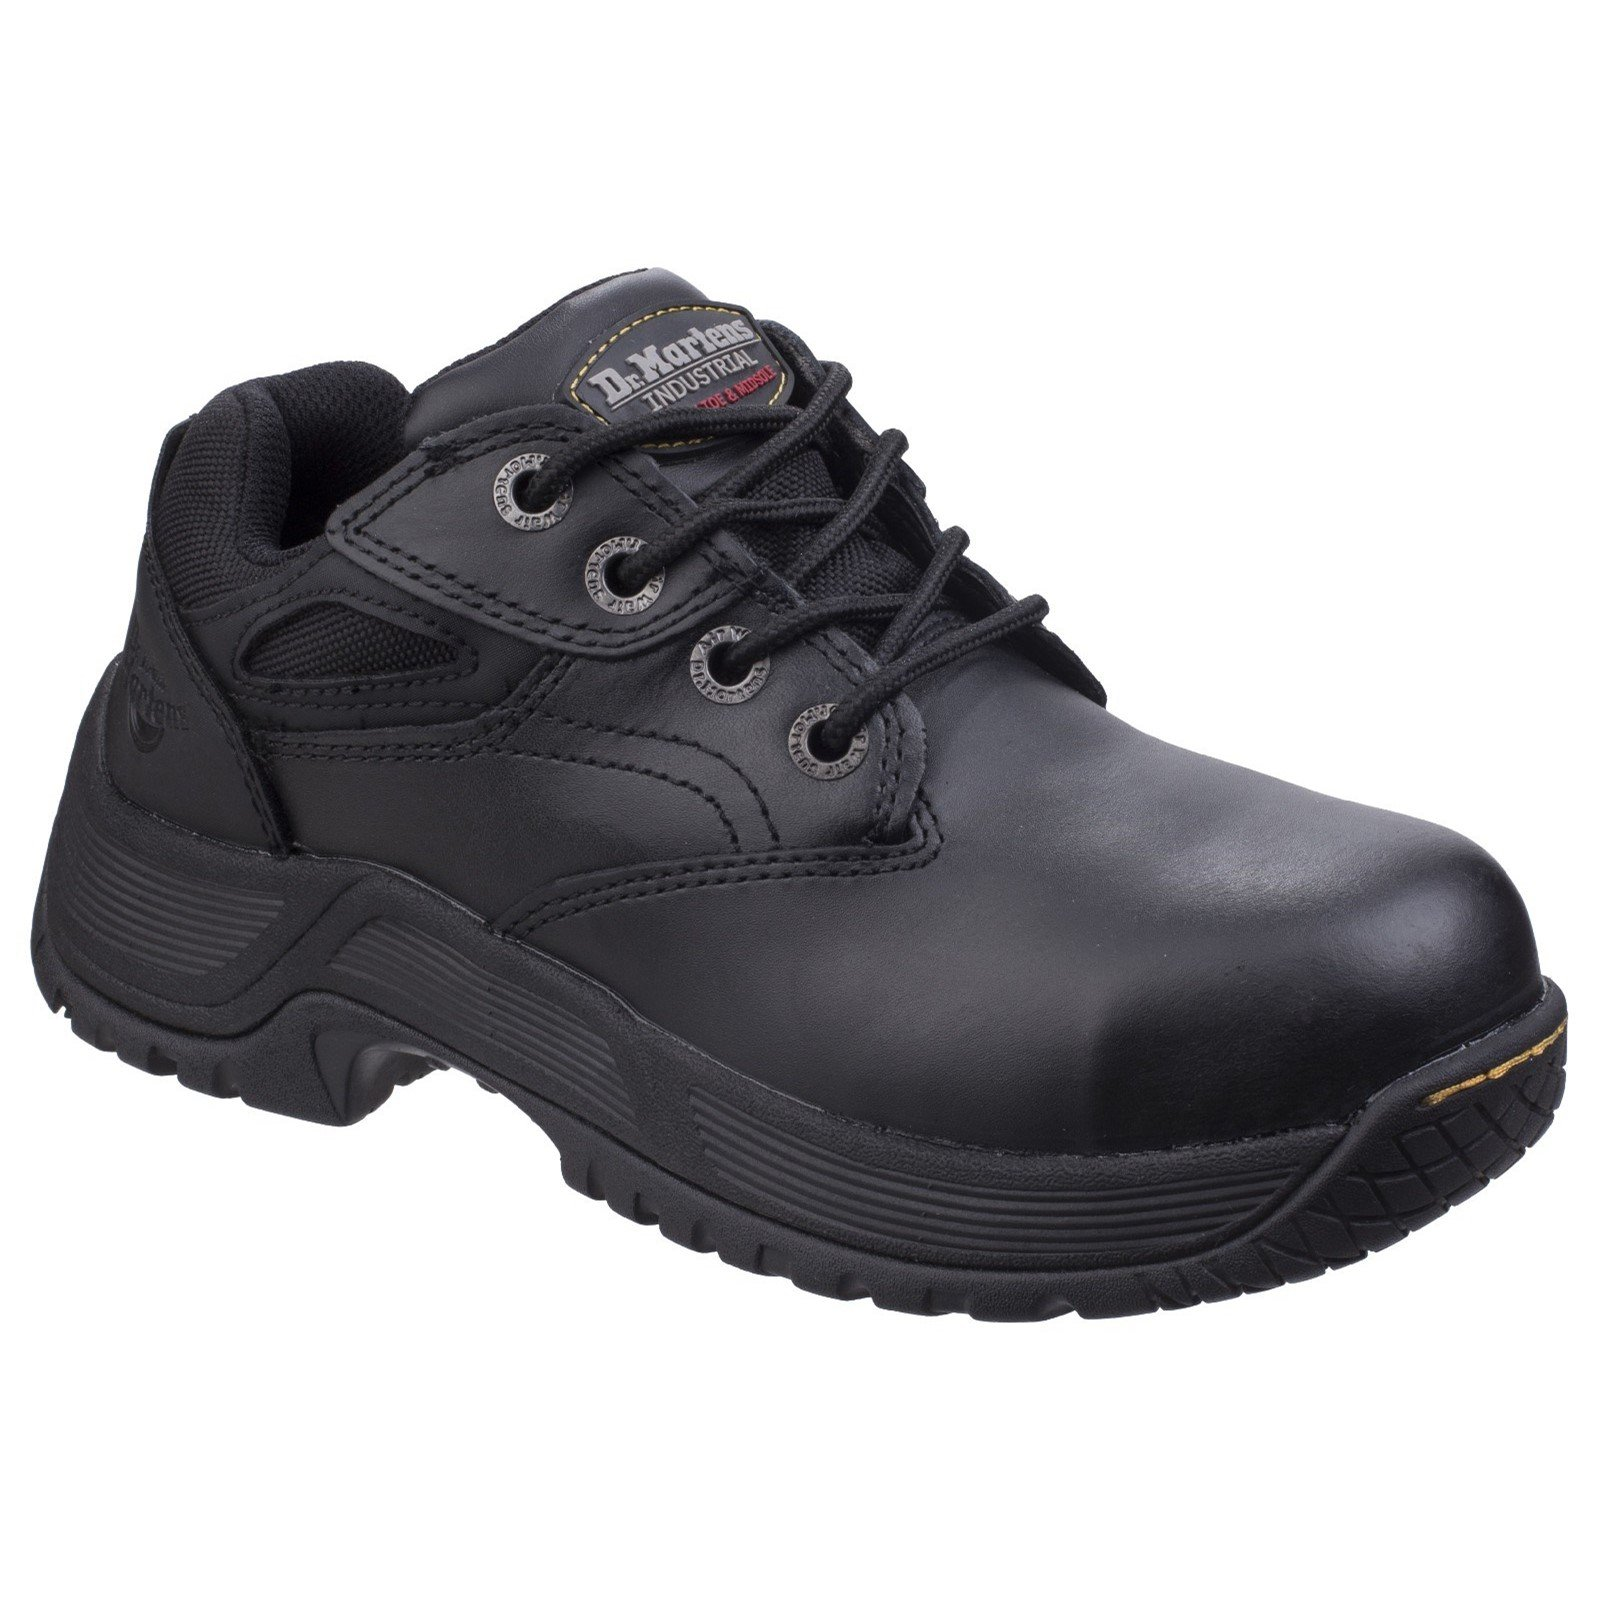 Dr Martens Unisex Calvert Steel Toe Safety Trainer Black 26022 - Black 6